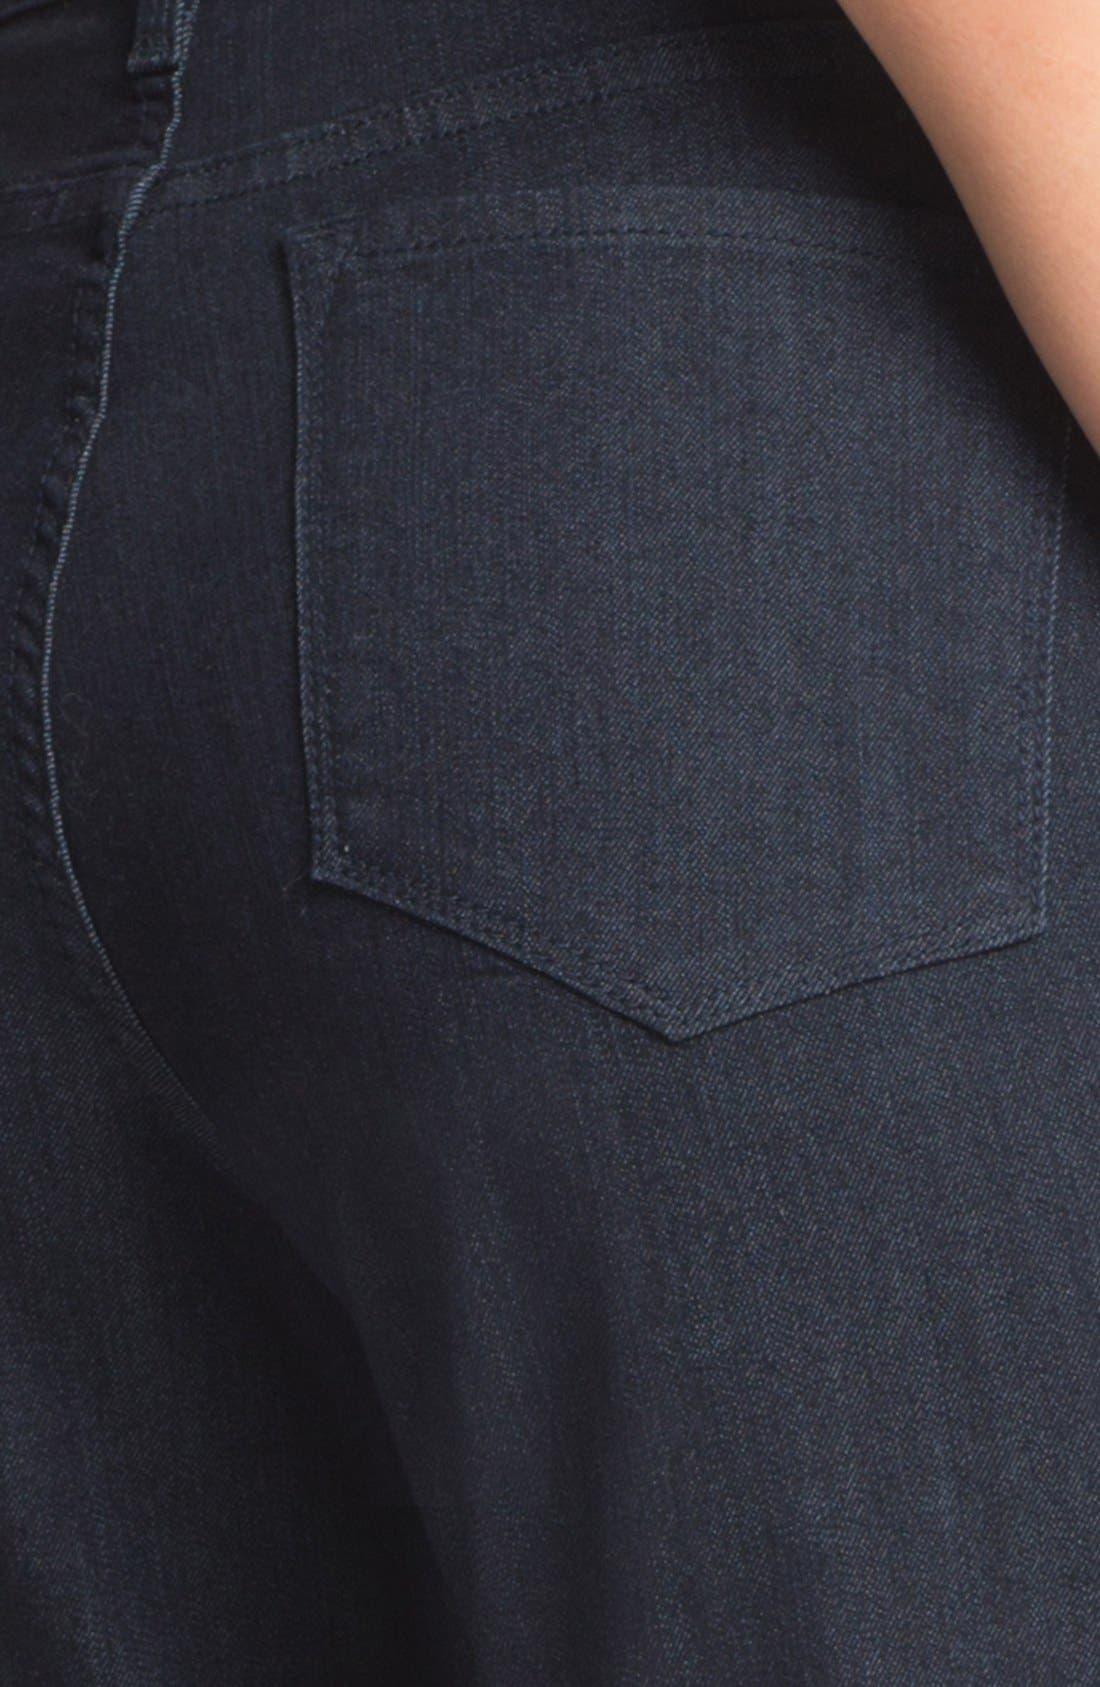 Alternate Image 3  - NYDJ 'Olga' Crop Jeans